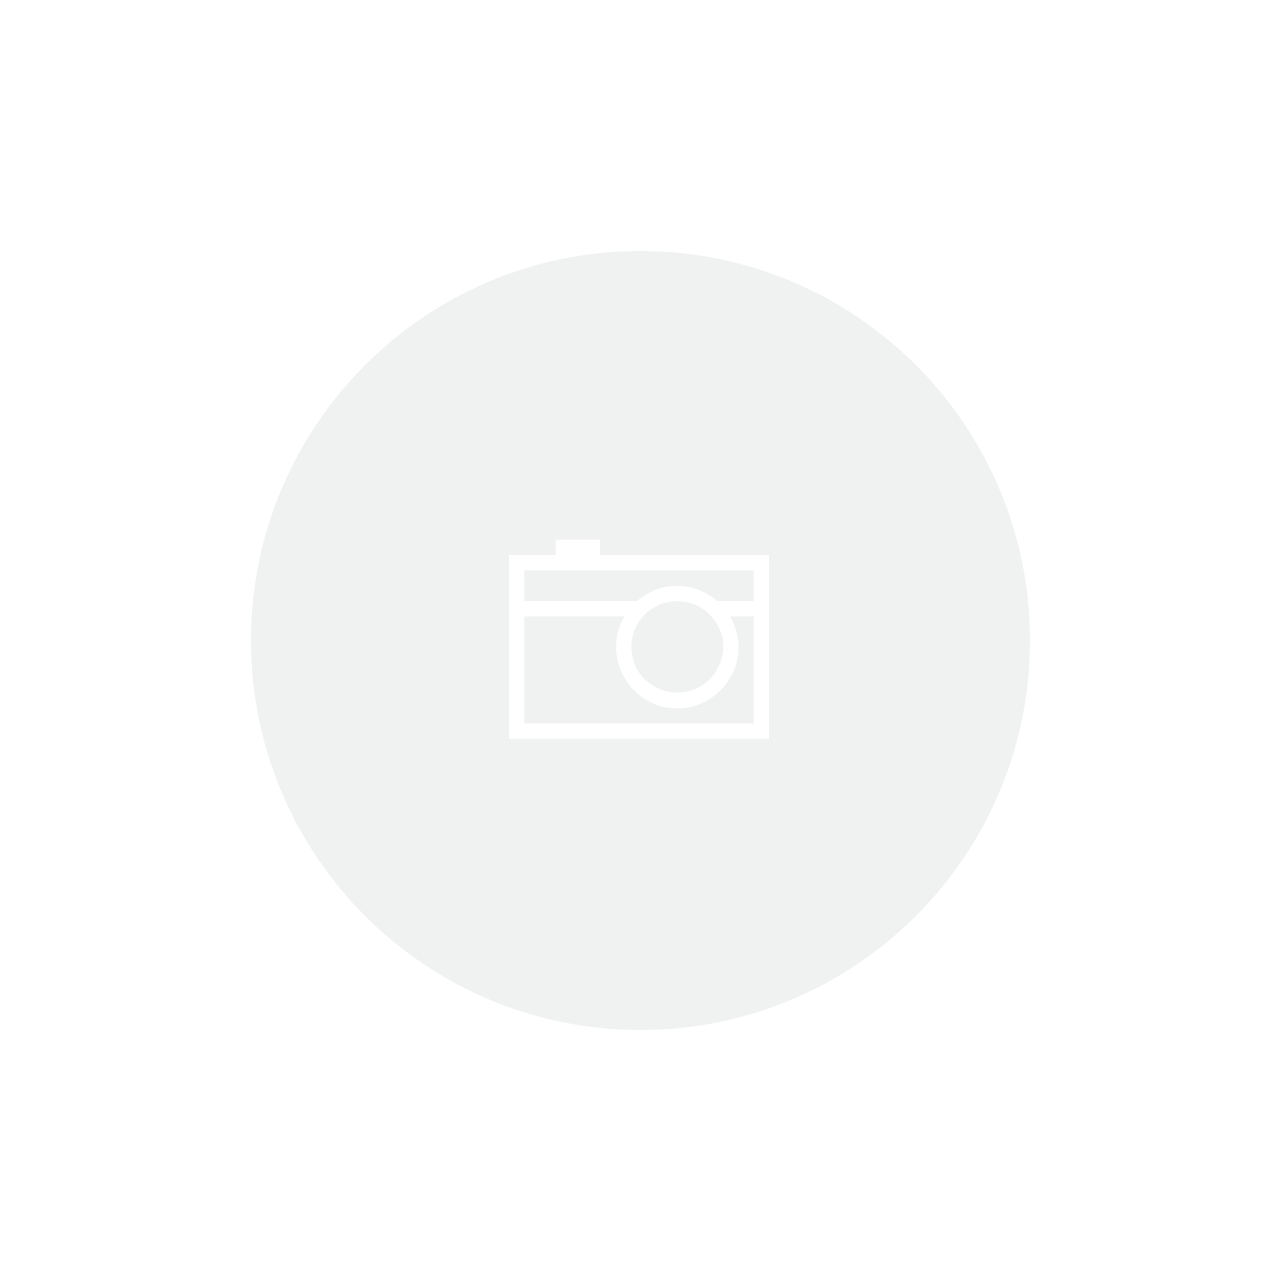 Pc Gamer Dawblade InfoParts - Intel CORE I3-8100, RX 580 8GB, 1TB, 8GB, Fonte 600w, Gabinete